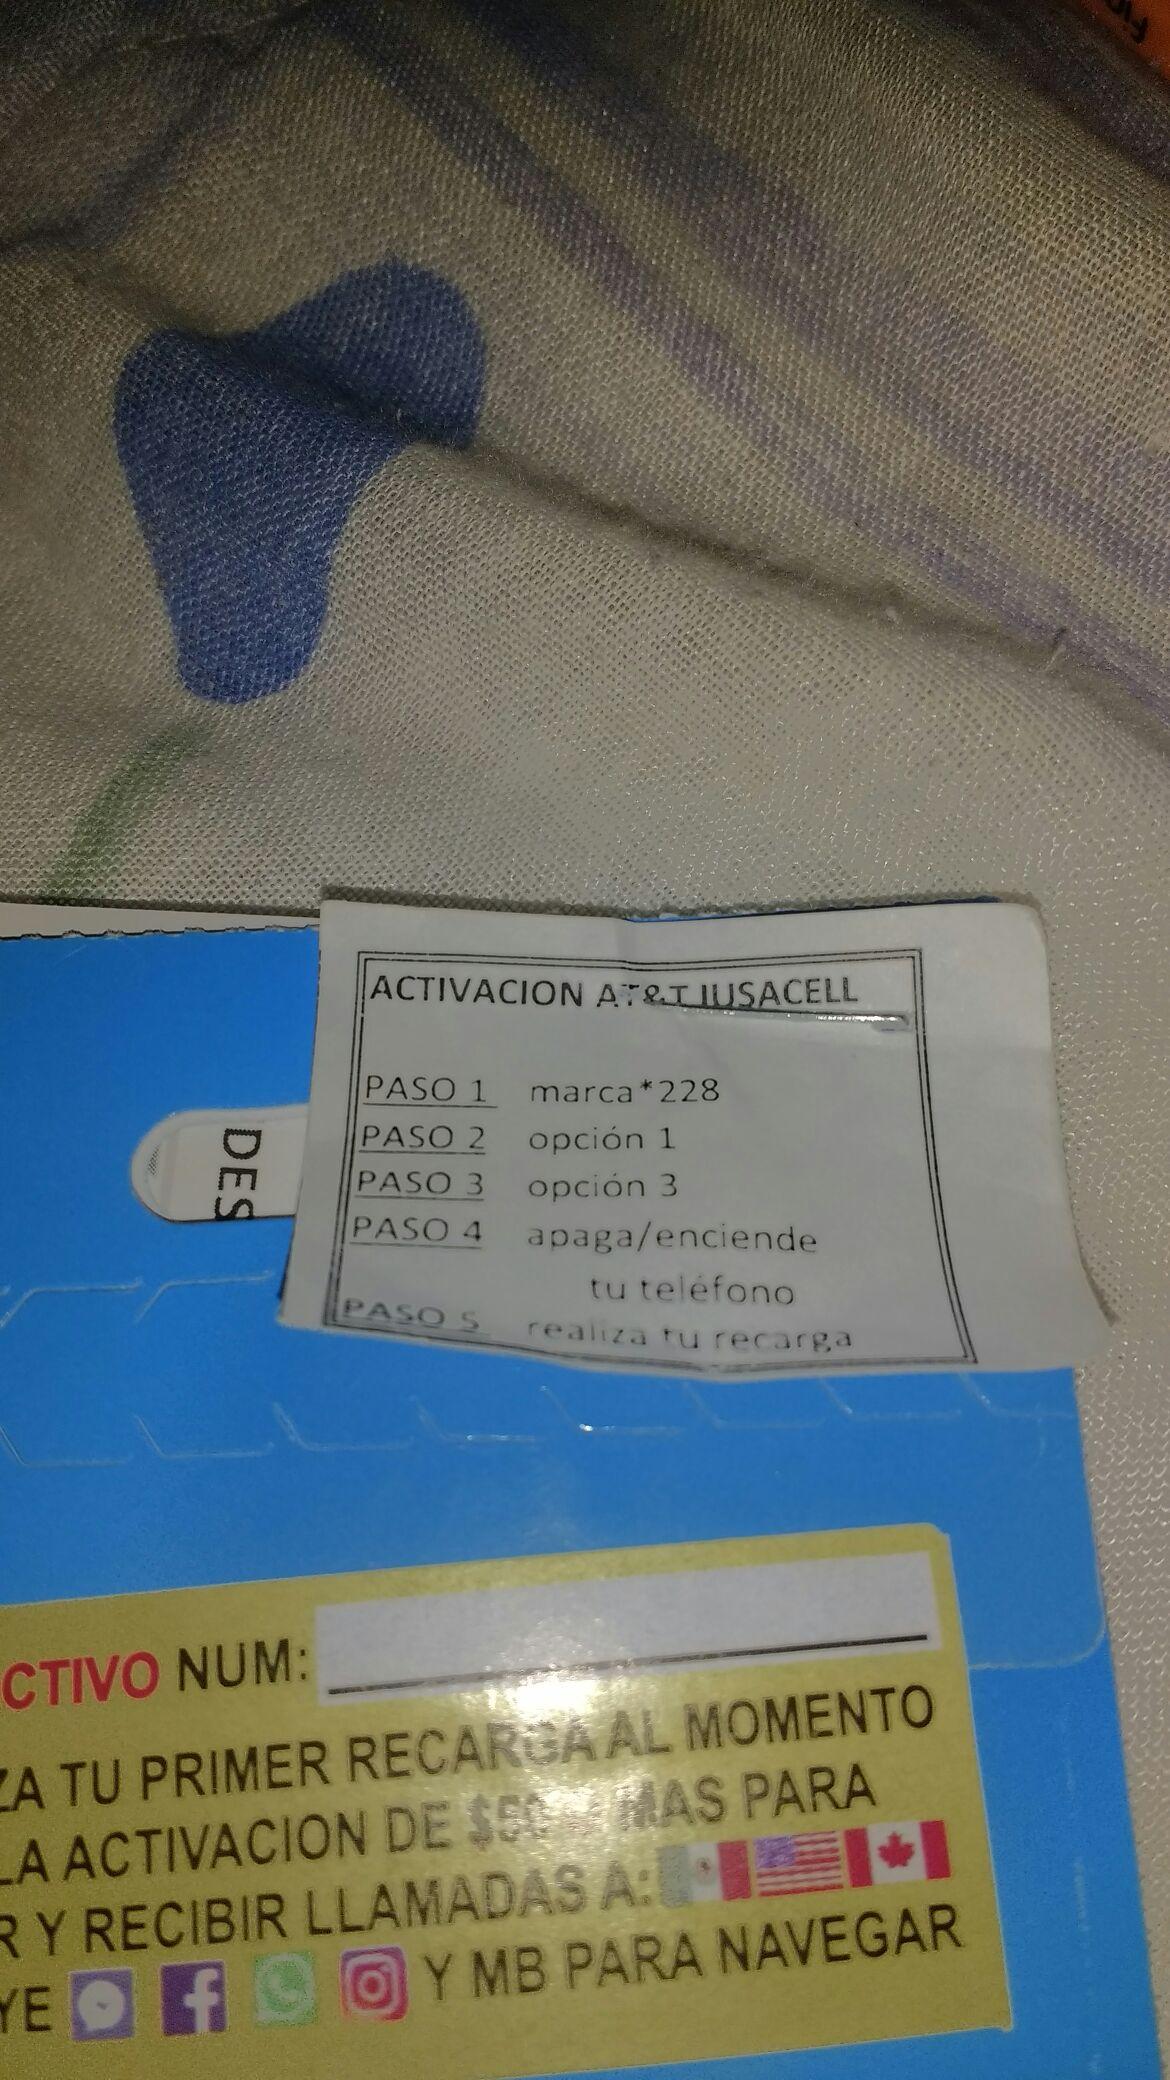 791512-0deXP.jpg